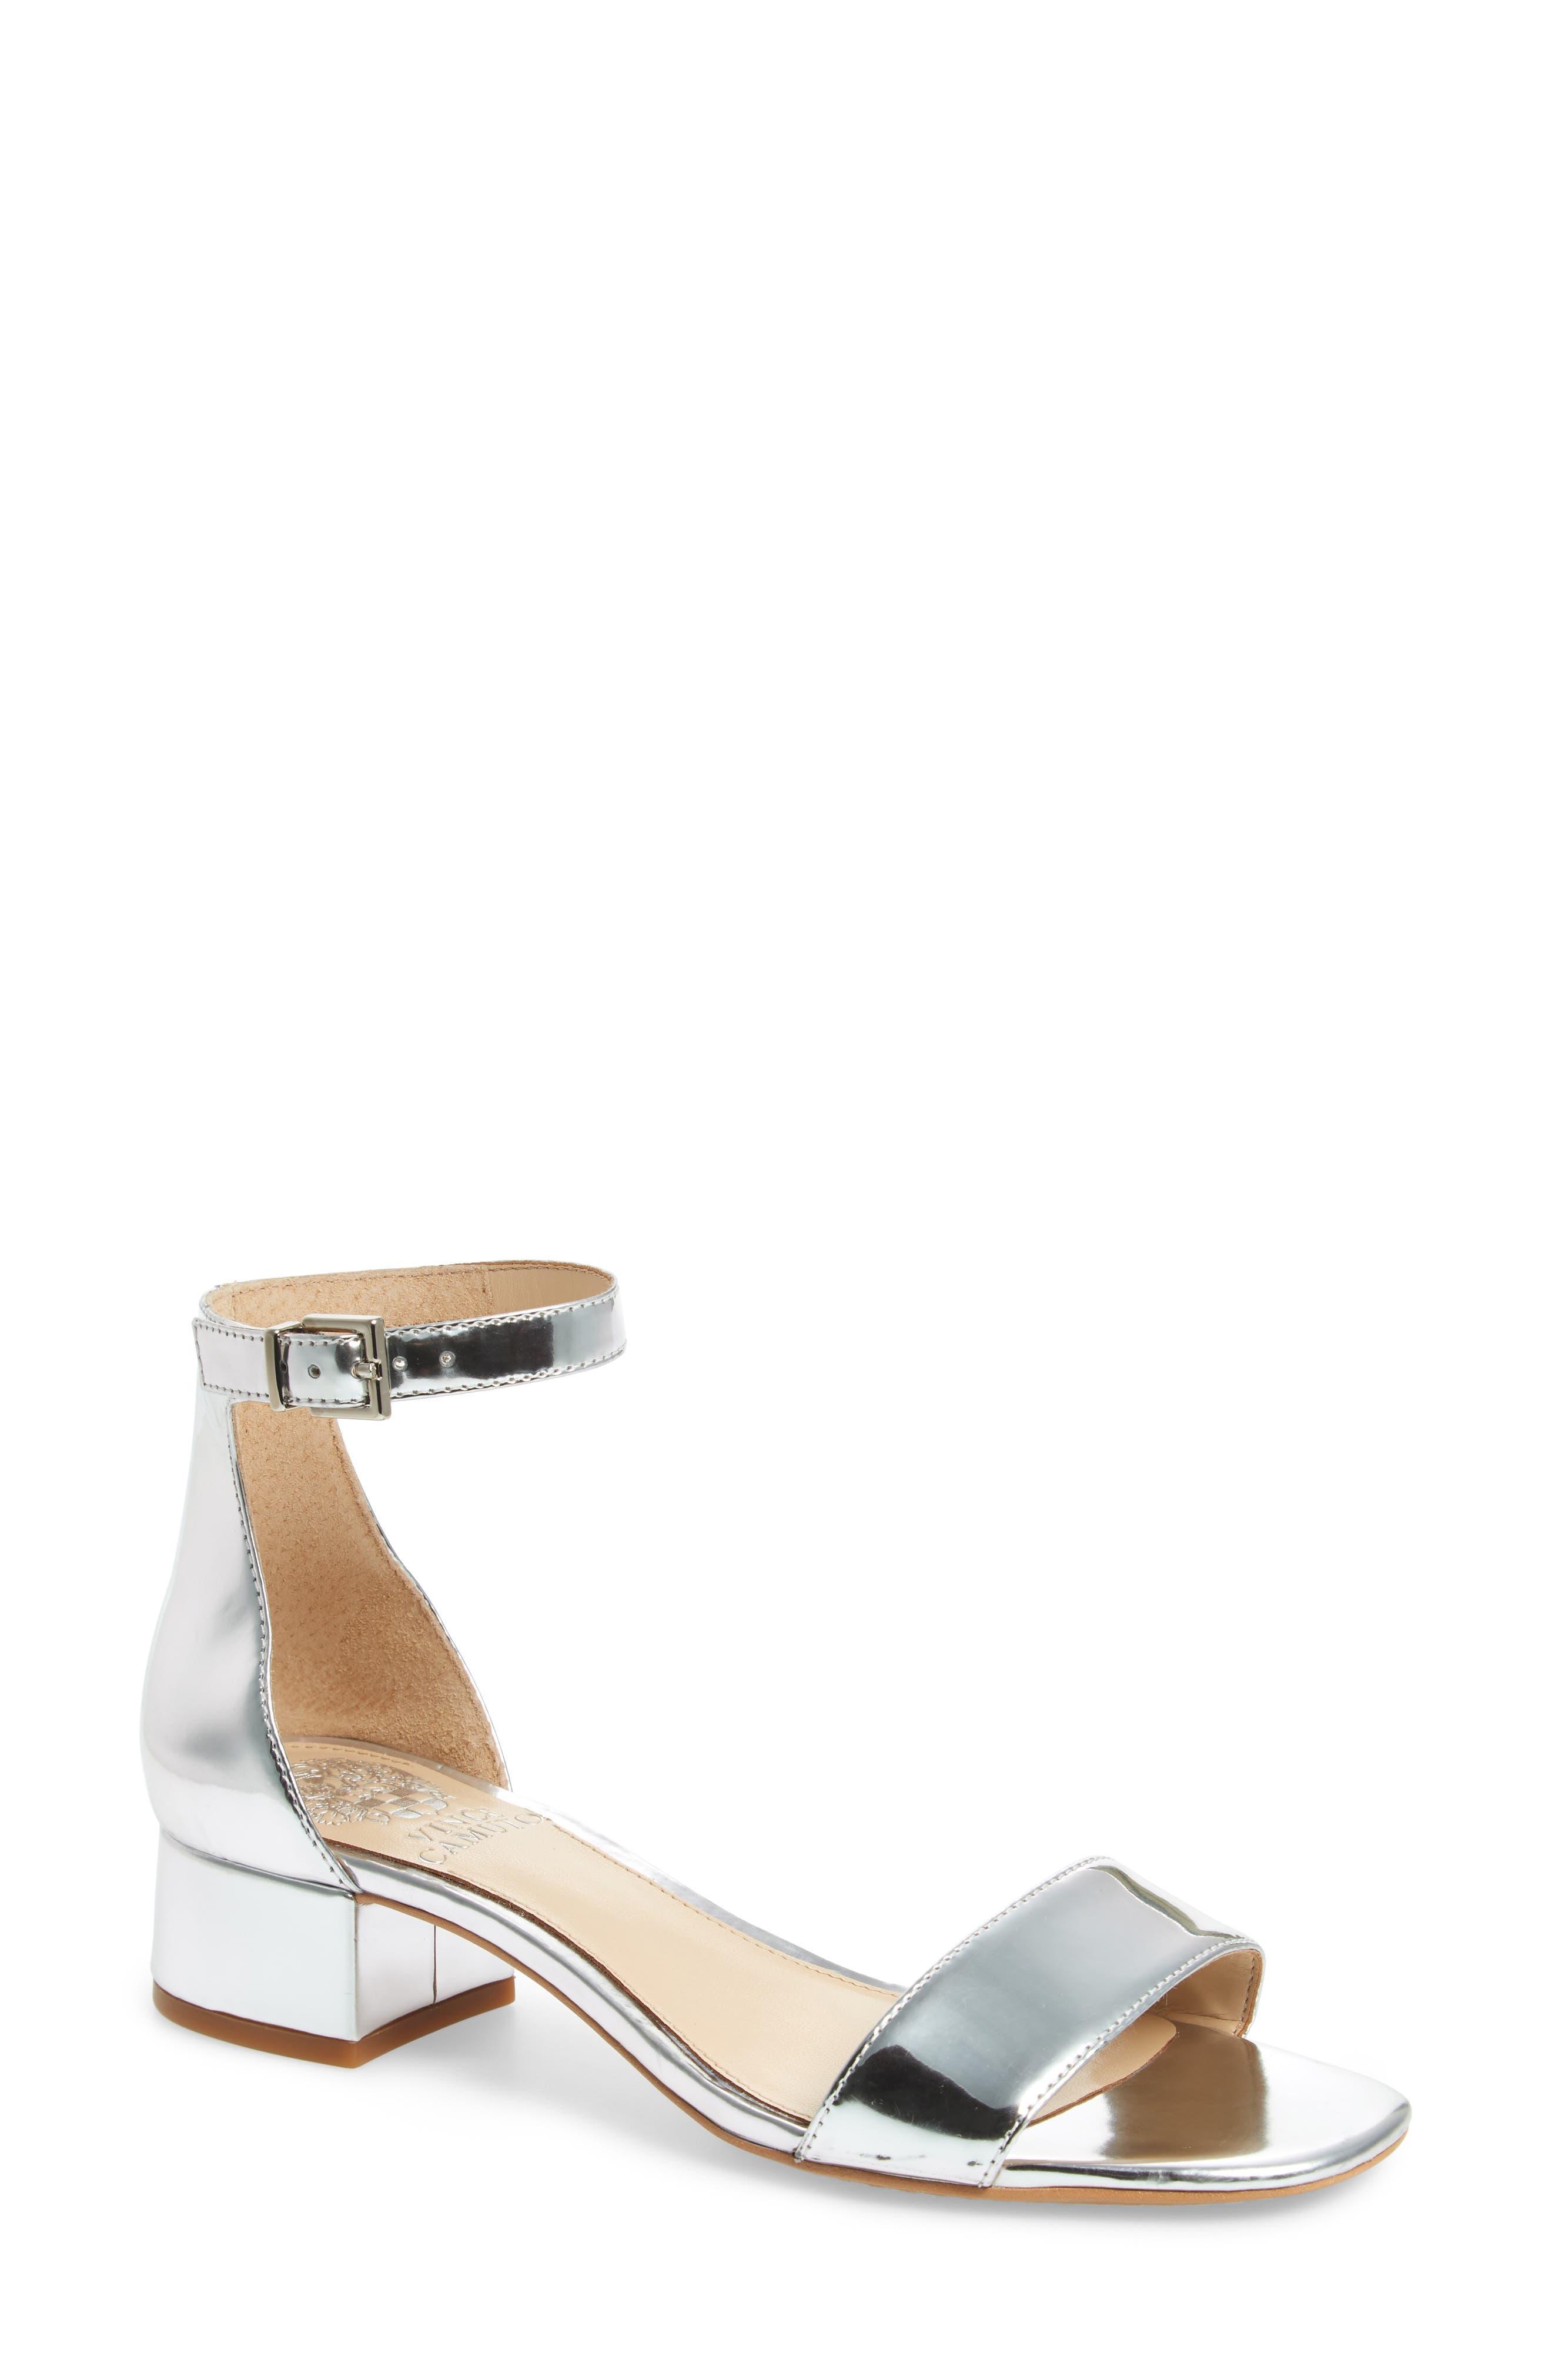 Sasseta Sandal,                             Main thumbnail 1, color,                             Bright Silver